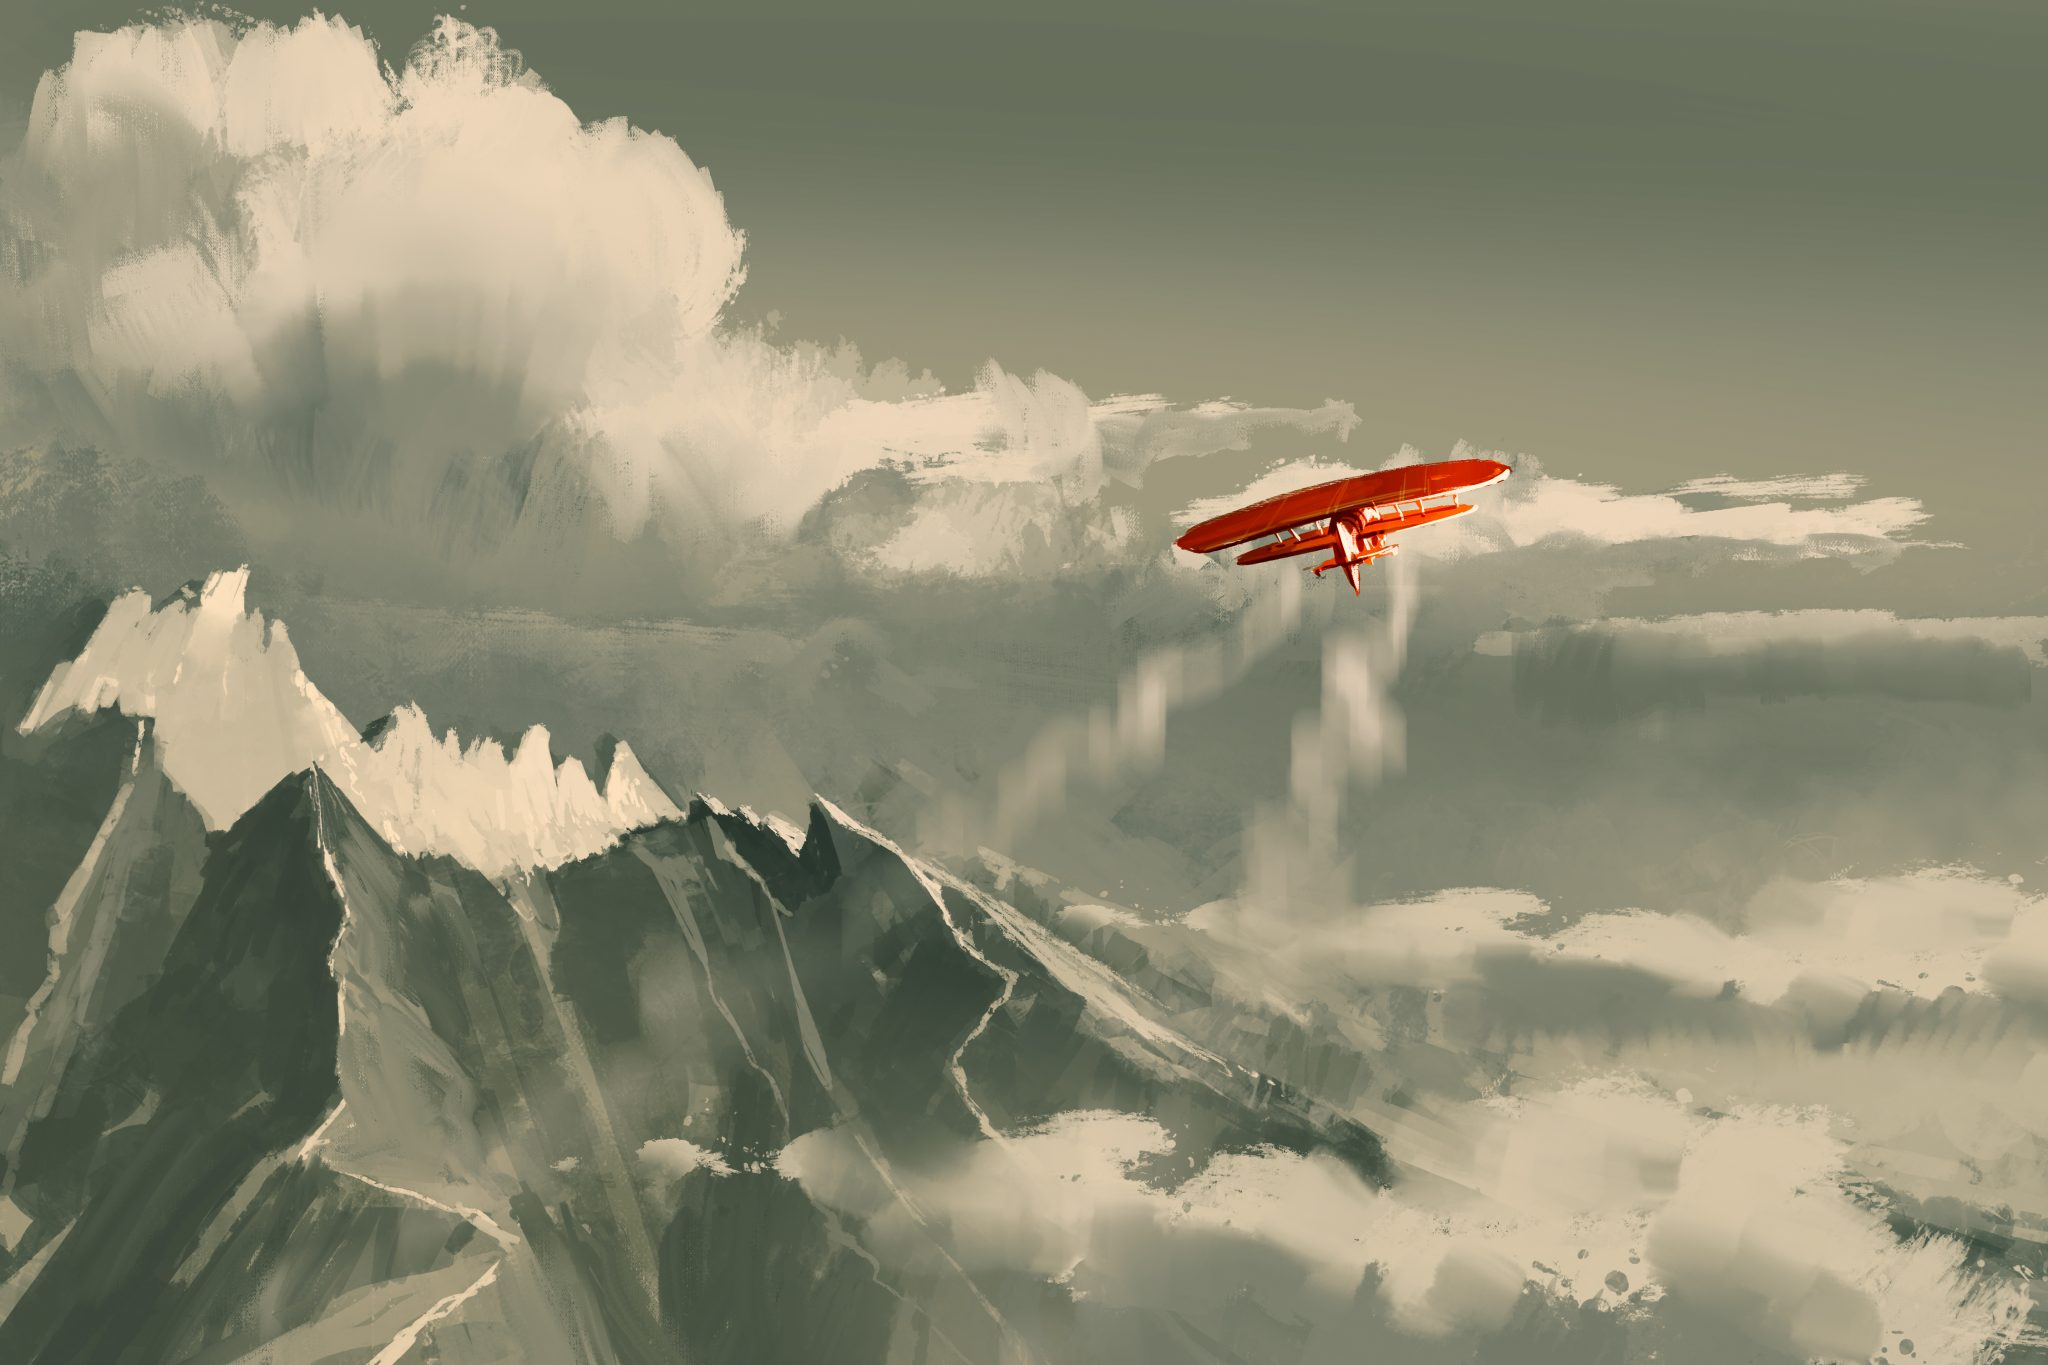 Aereo vola nel cielo